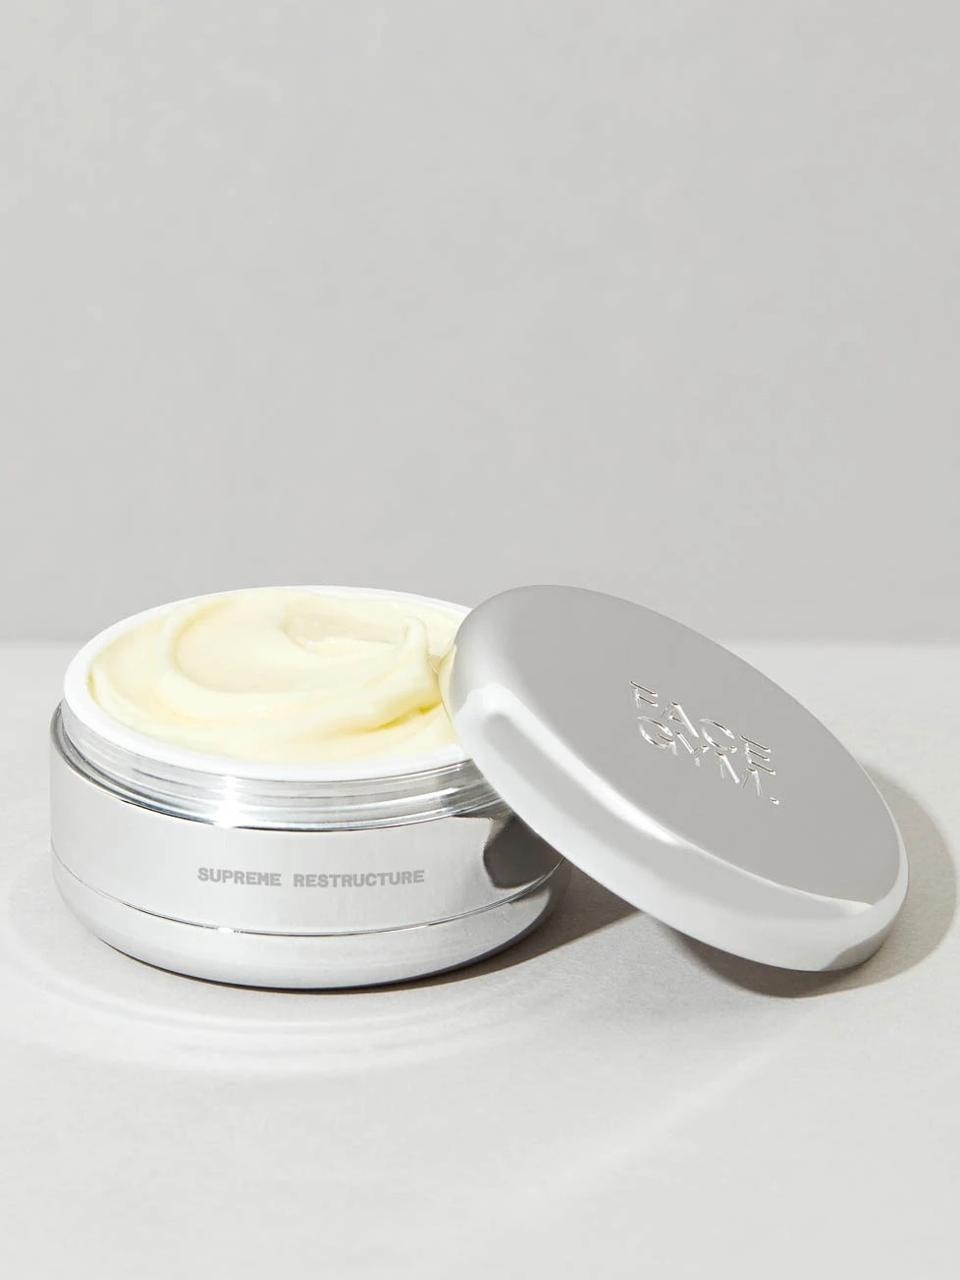 Face Gym Supreme Restructure Firming EGF Collagen Boosting Cream